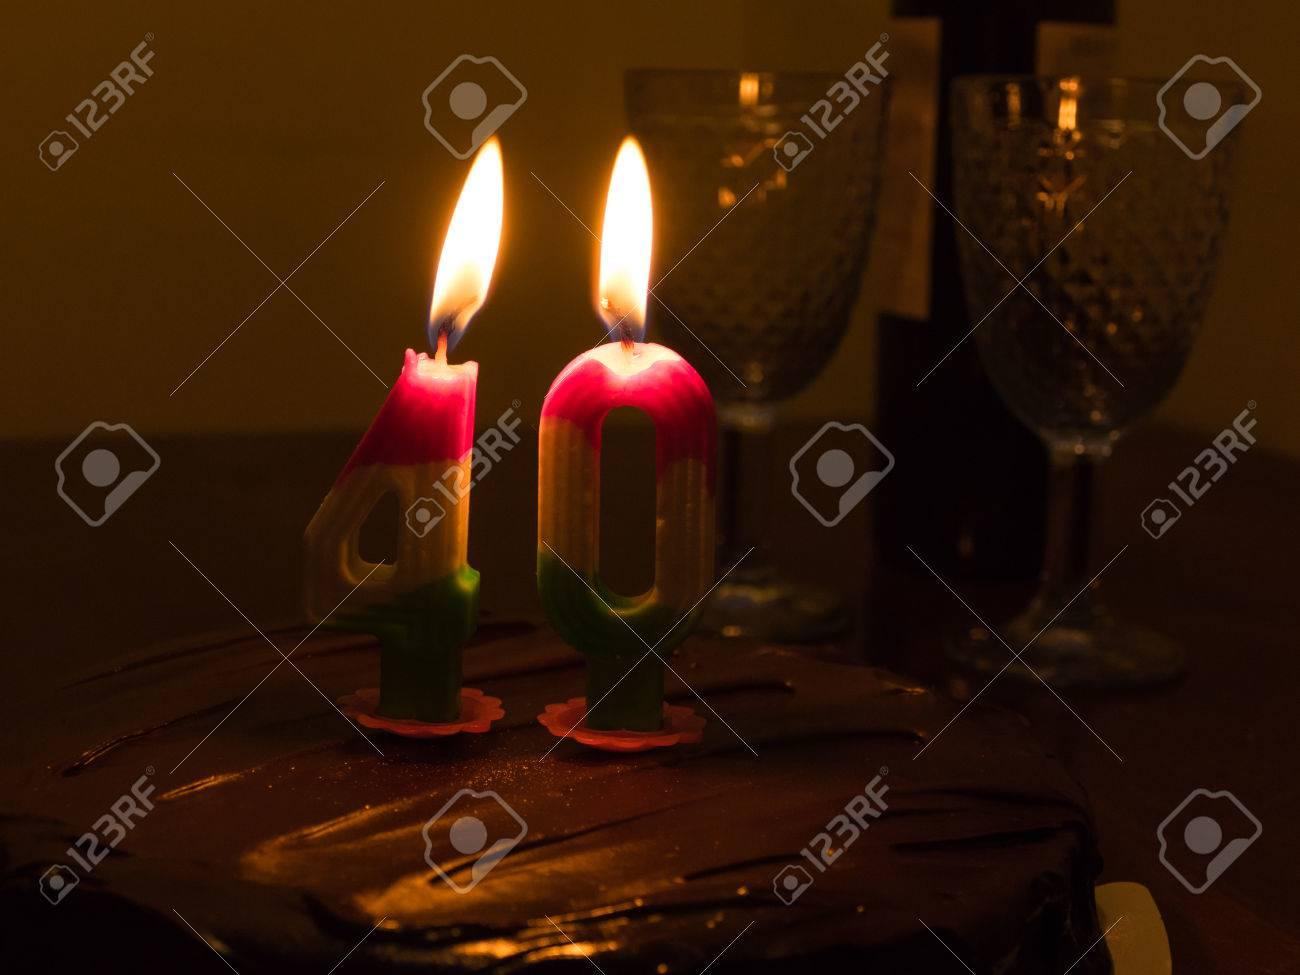 Chocolate Birthday Cake With Burning 40 Candle Stock Photo